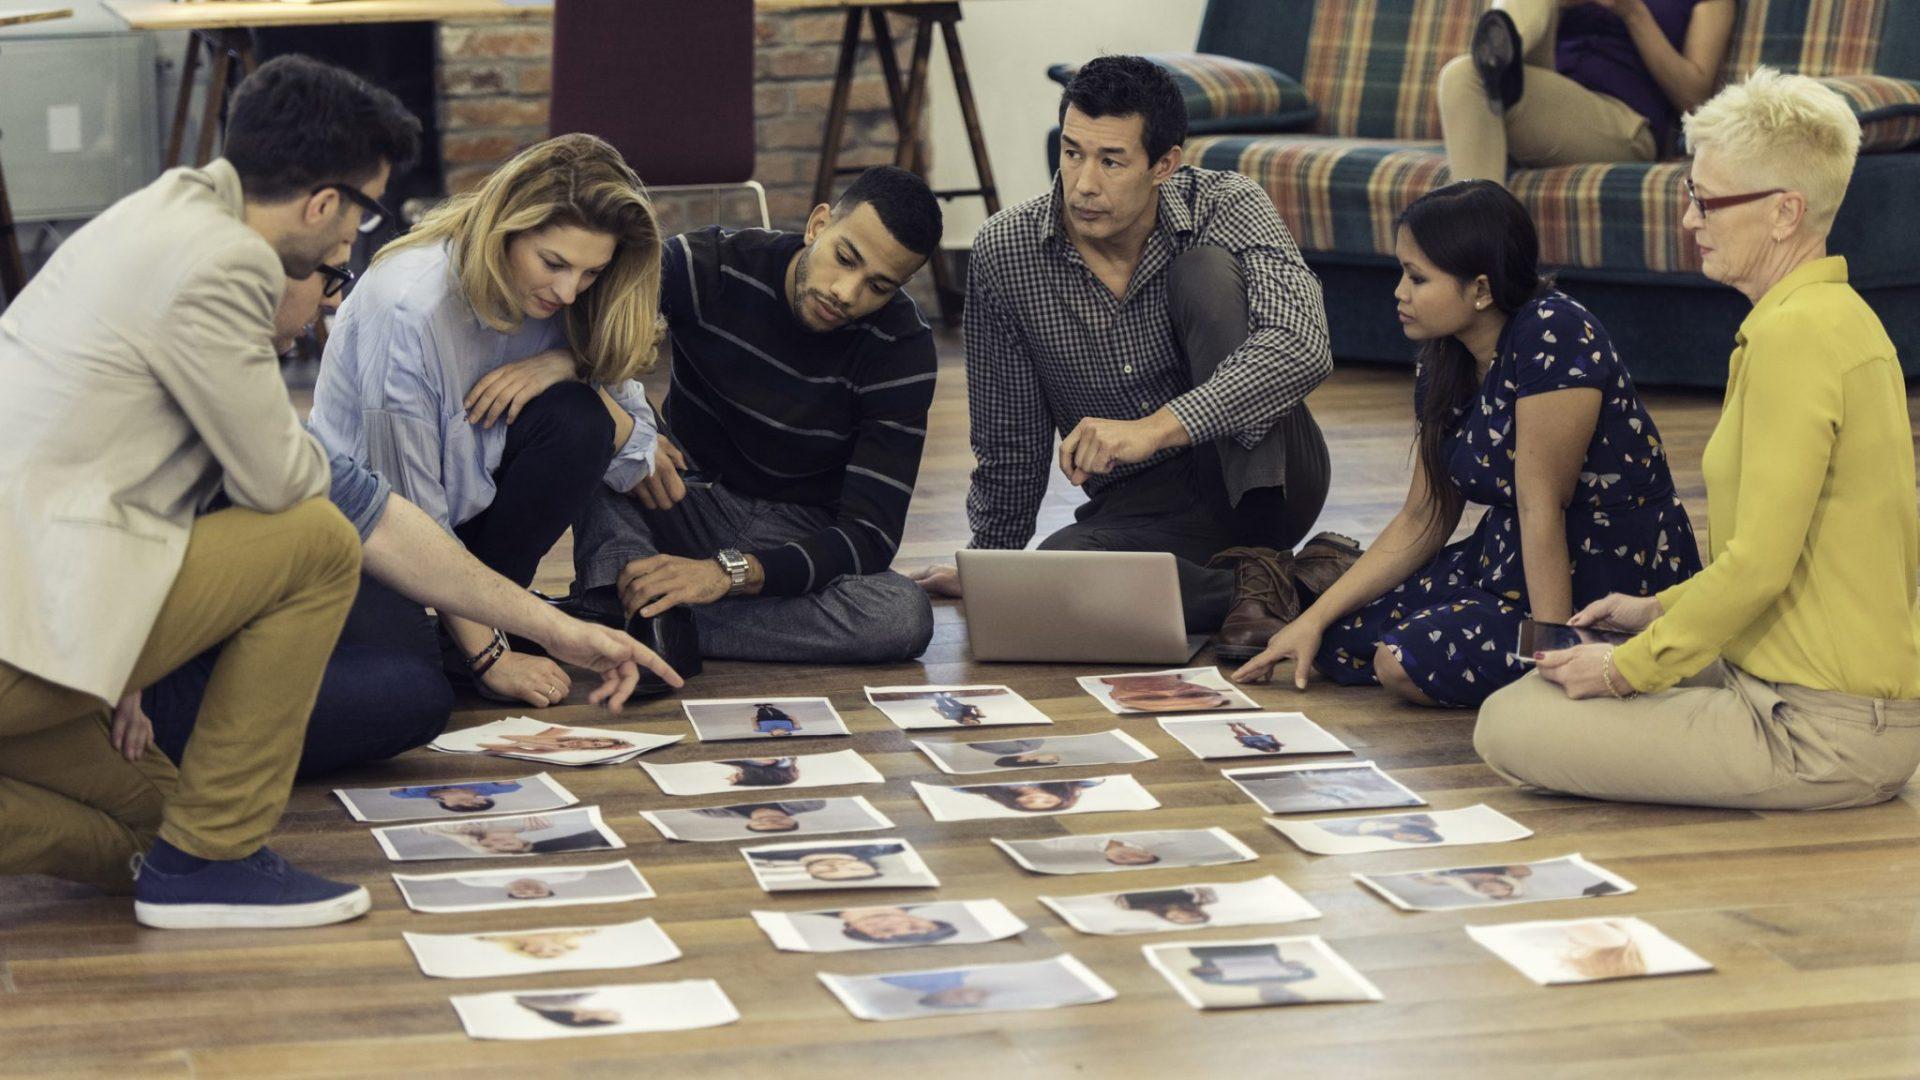 Ways charities embrace creativity